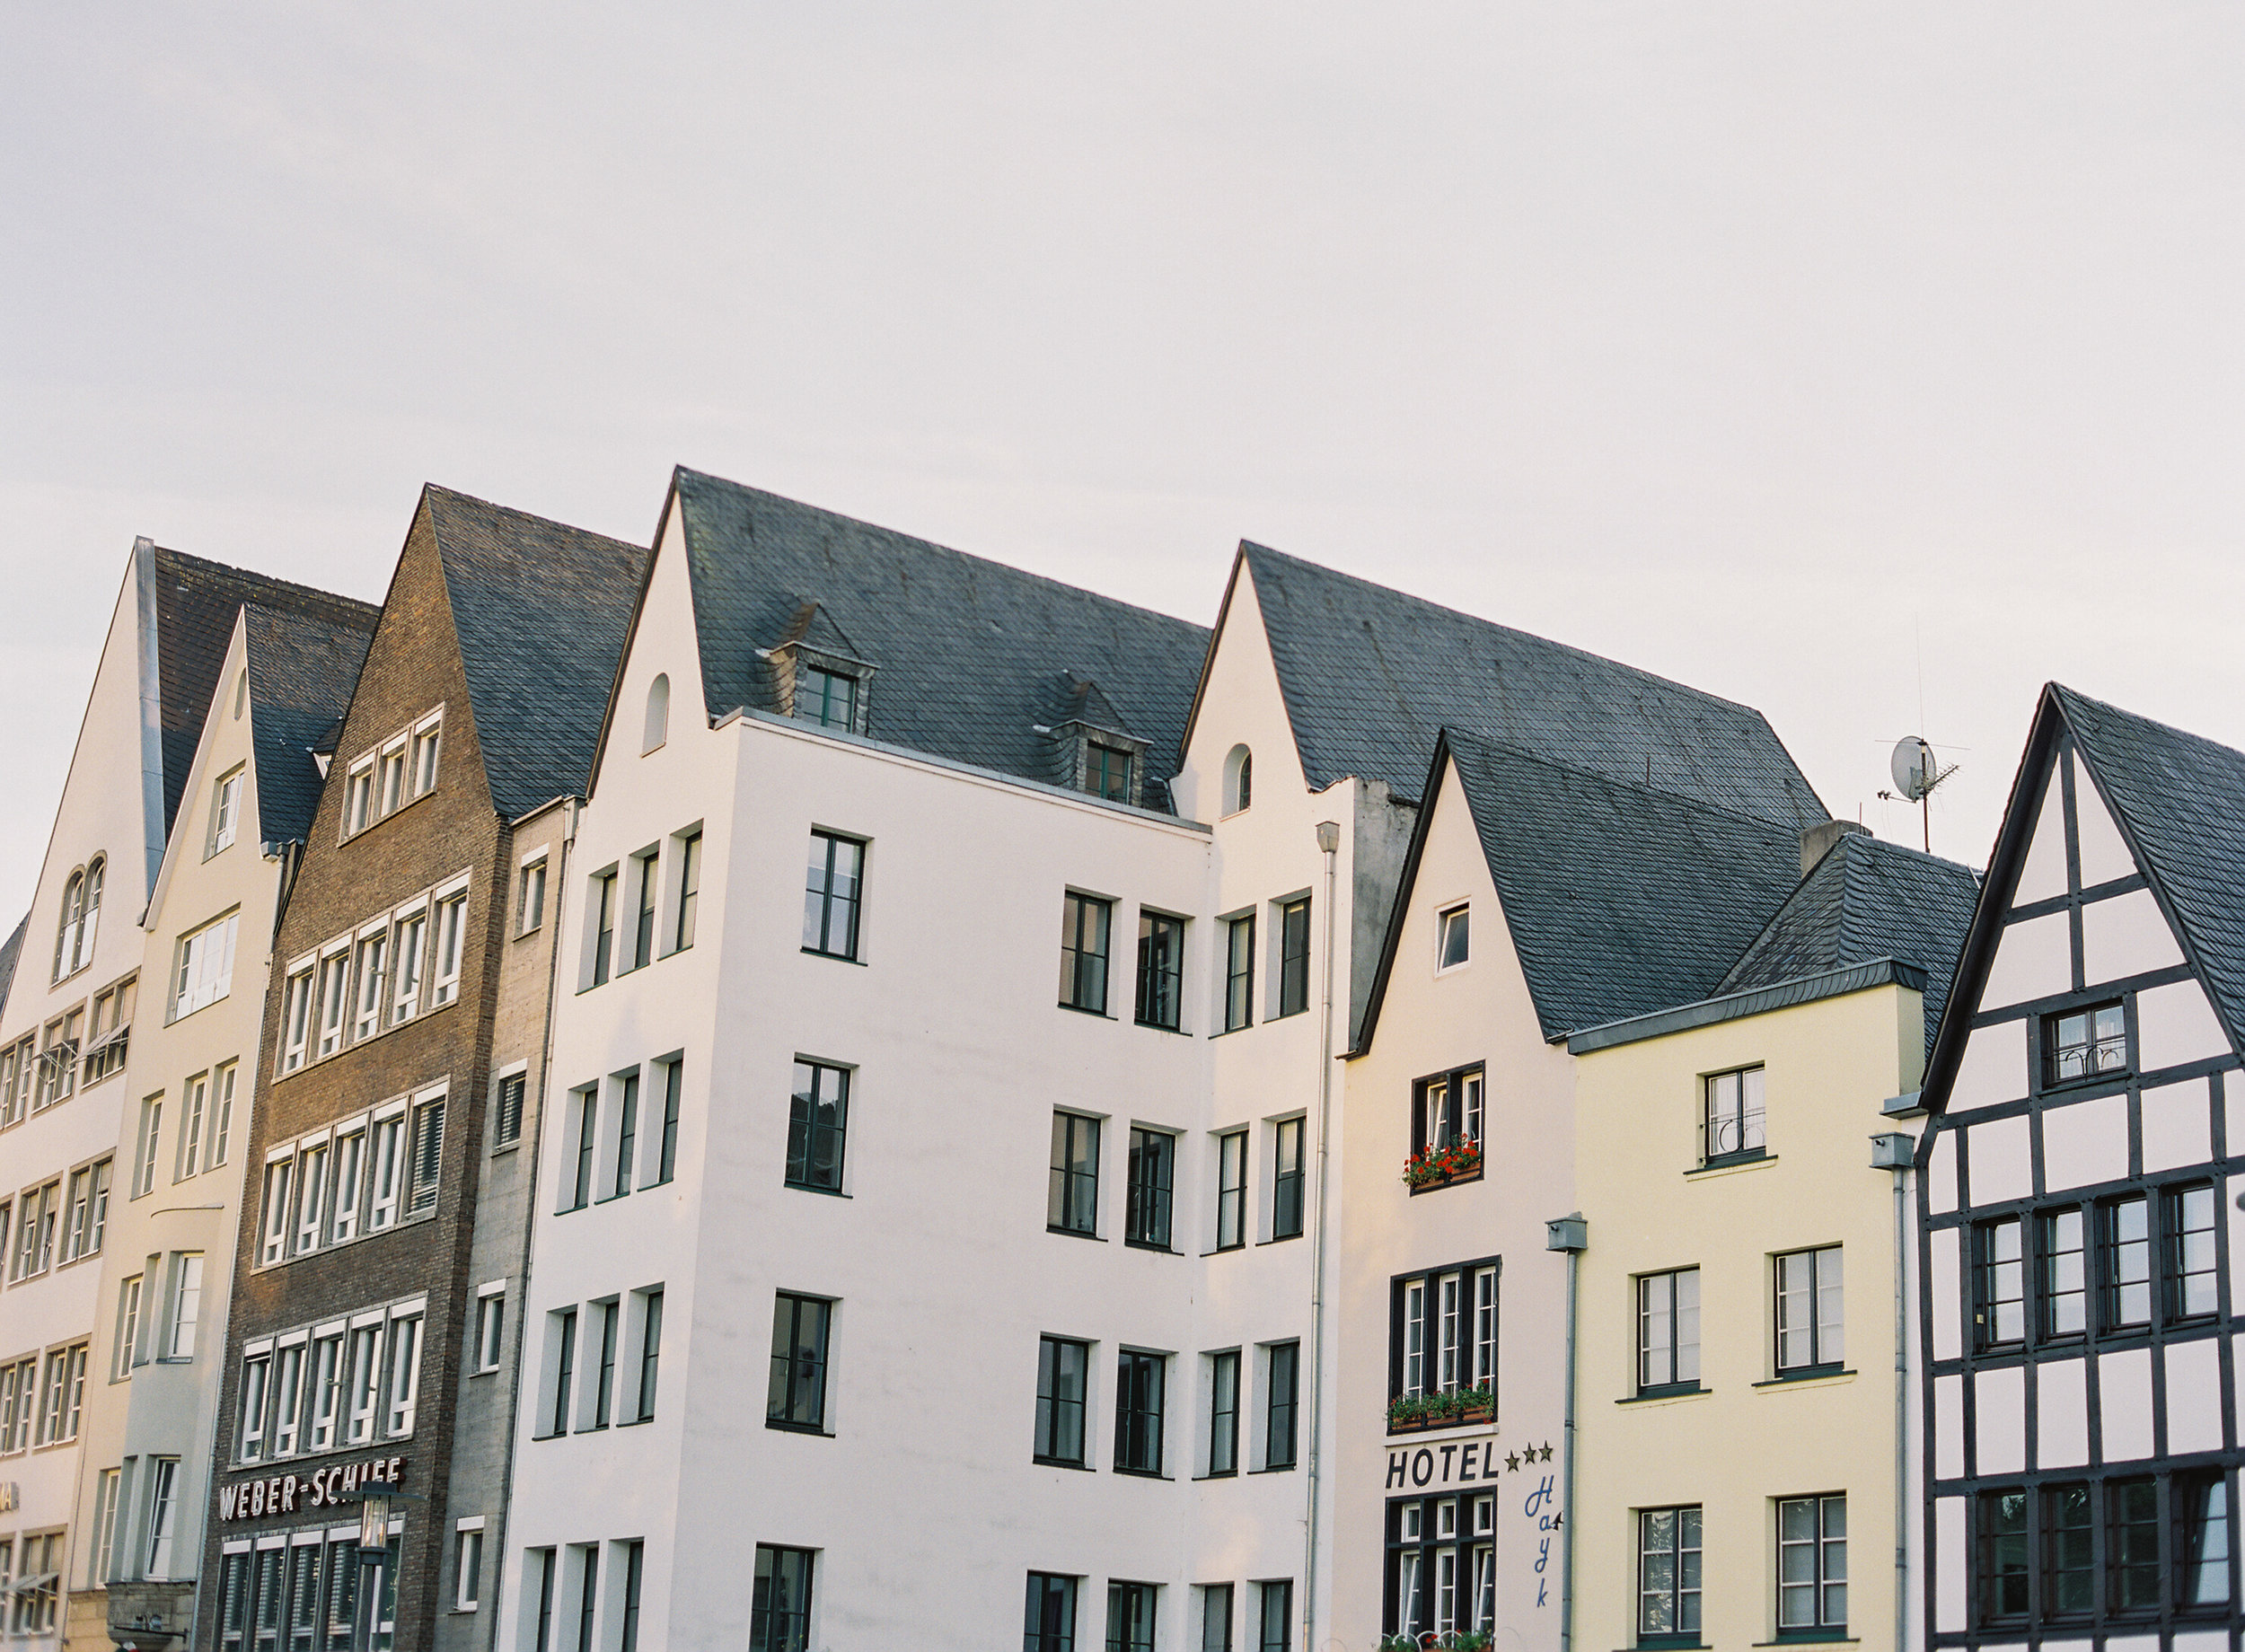 Cologne-Germany-8-Jen_Huang-008340-R1-004.jpg